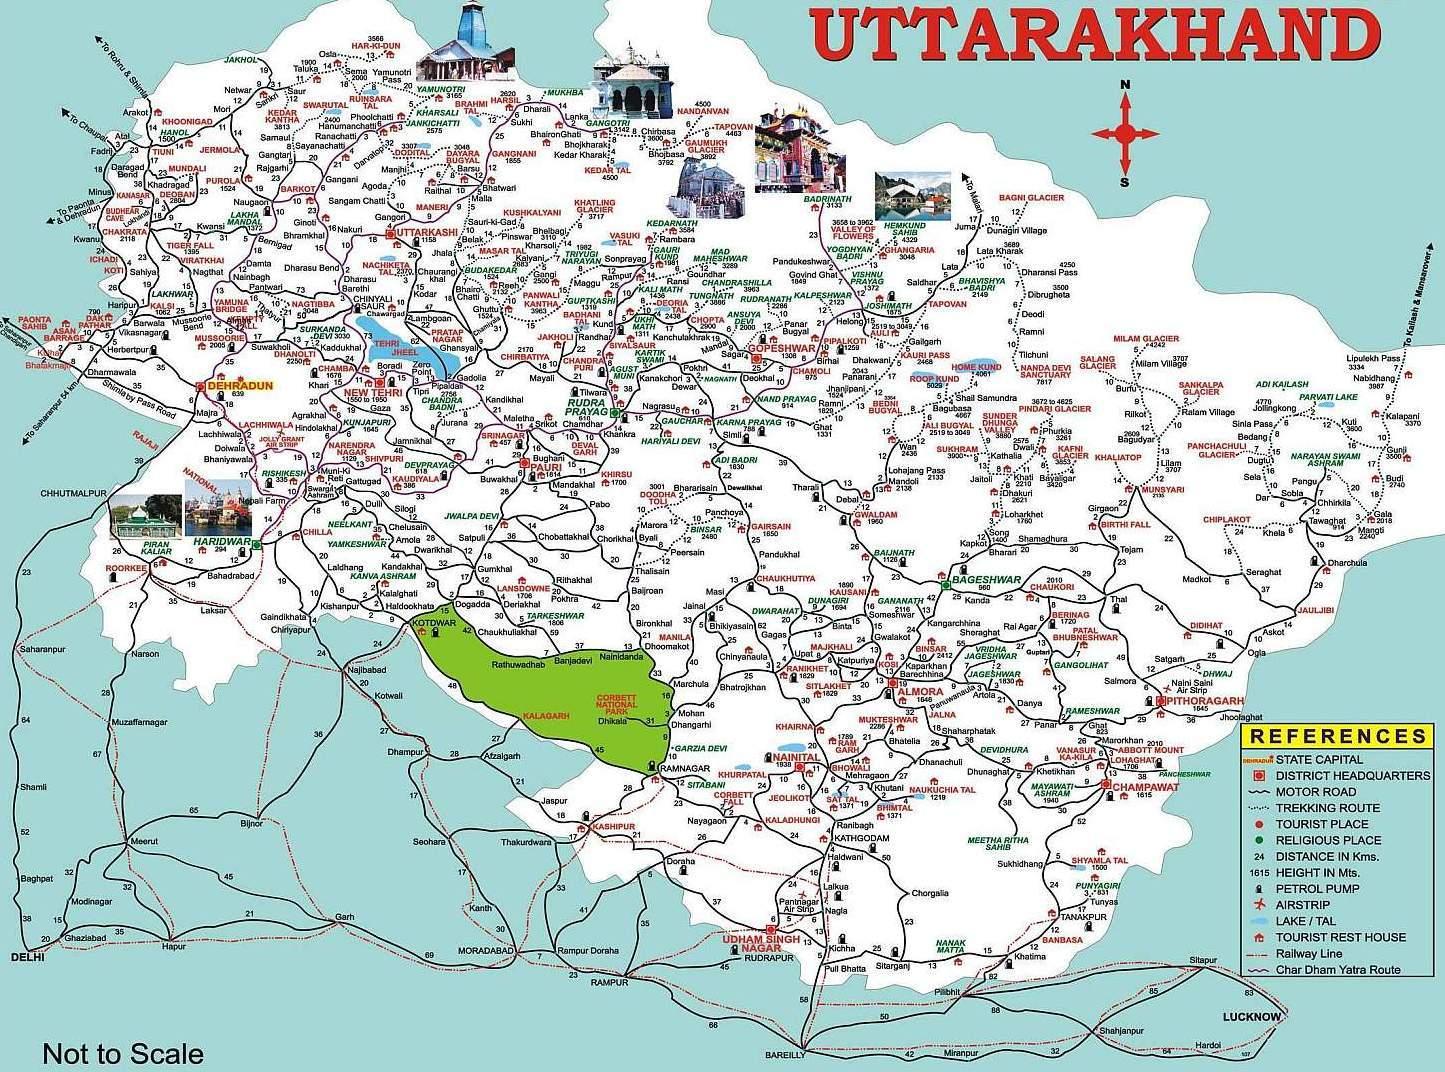 Uttarakhand Tourism Map - Uttaranchal Tourism Map Portal